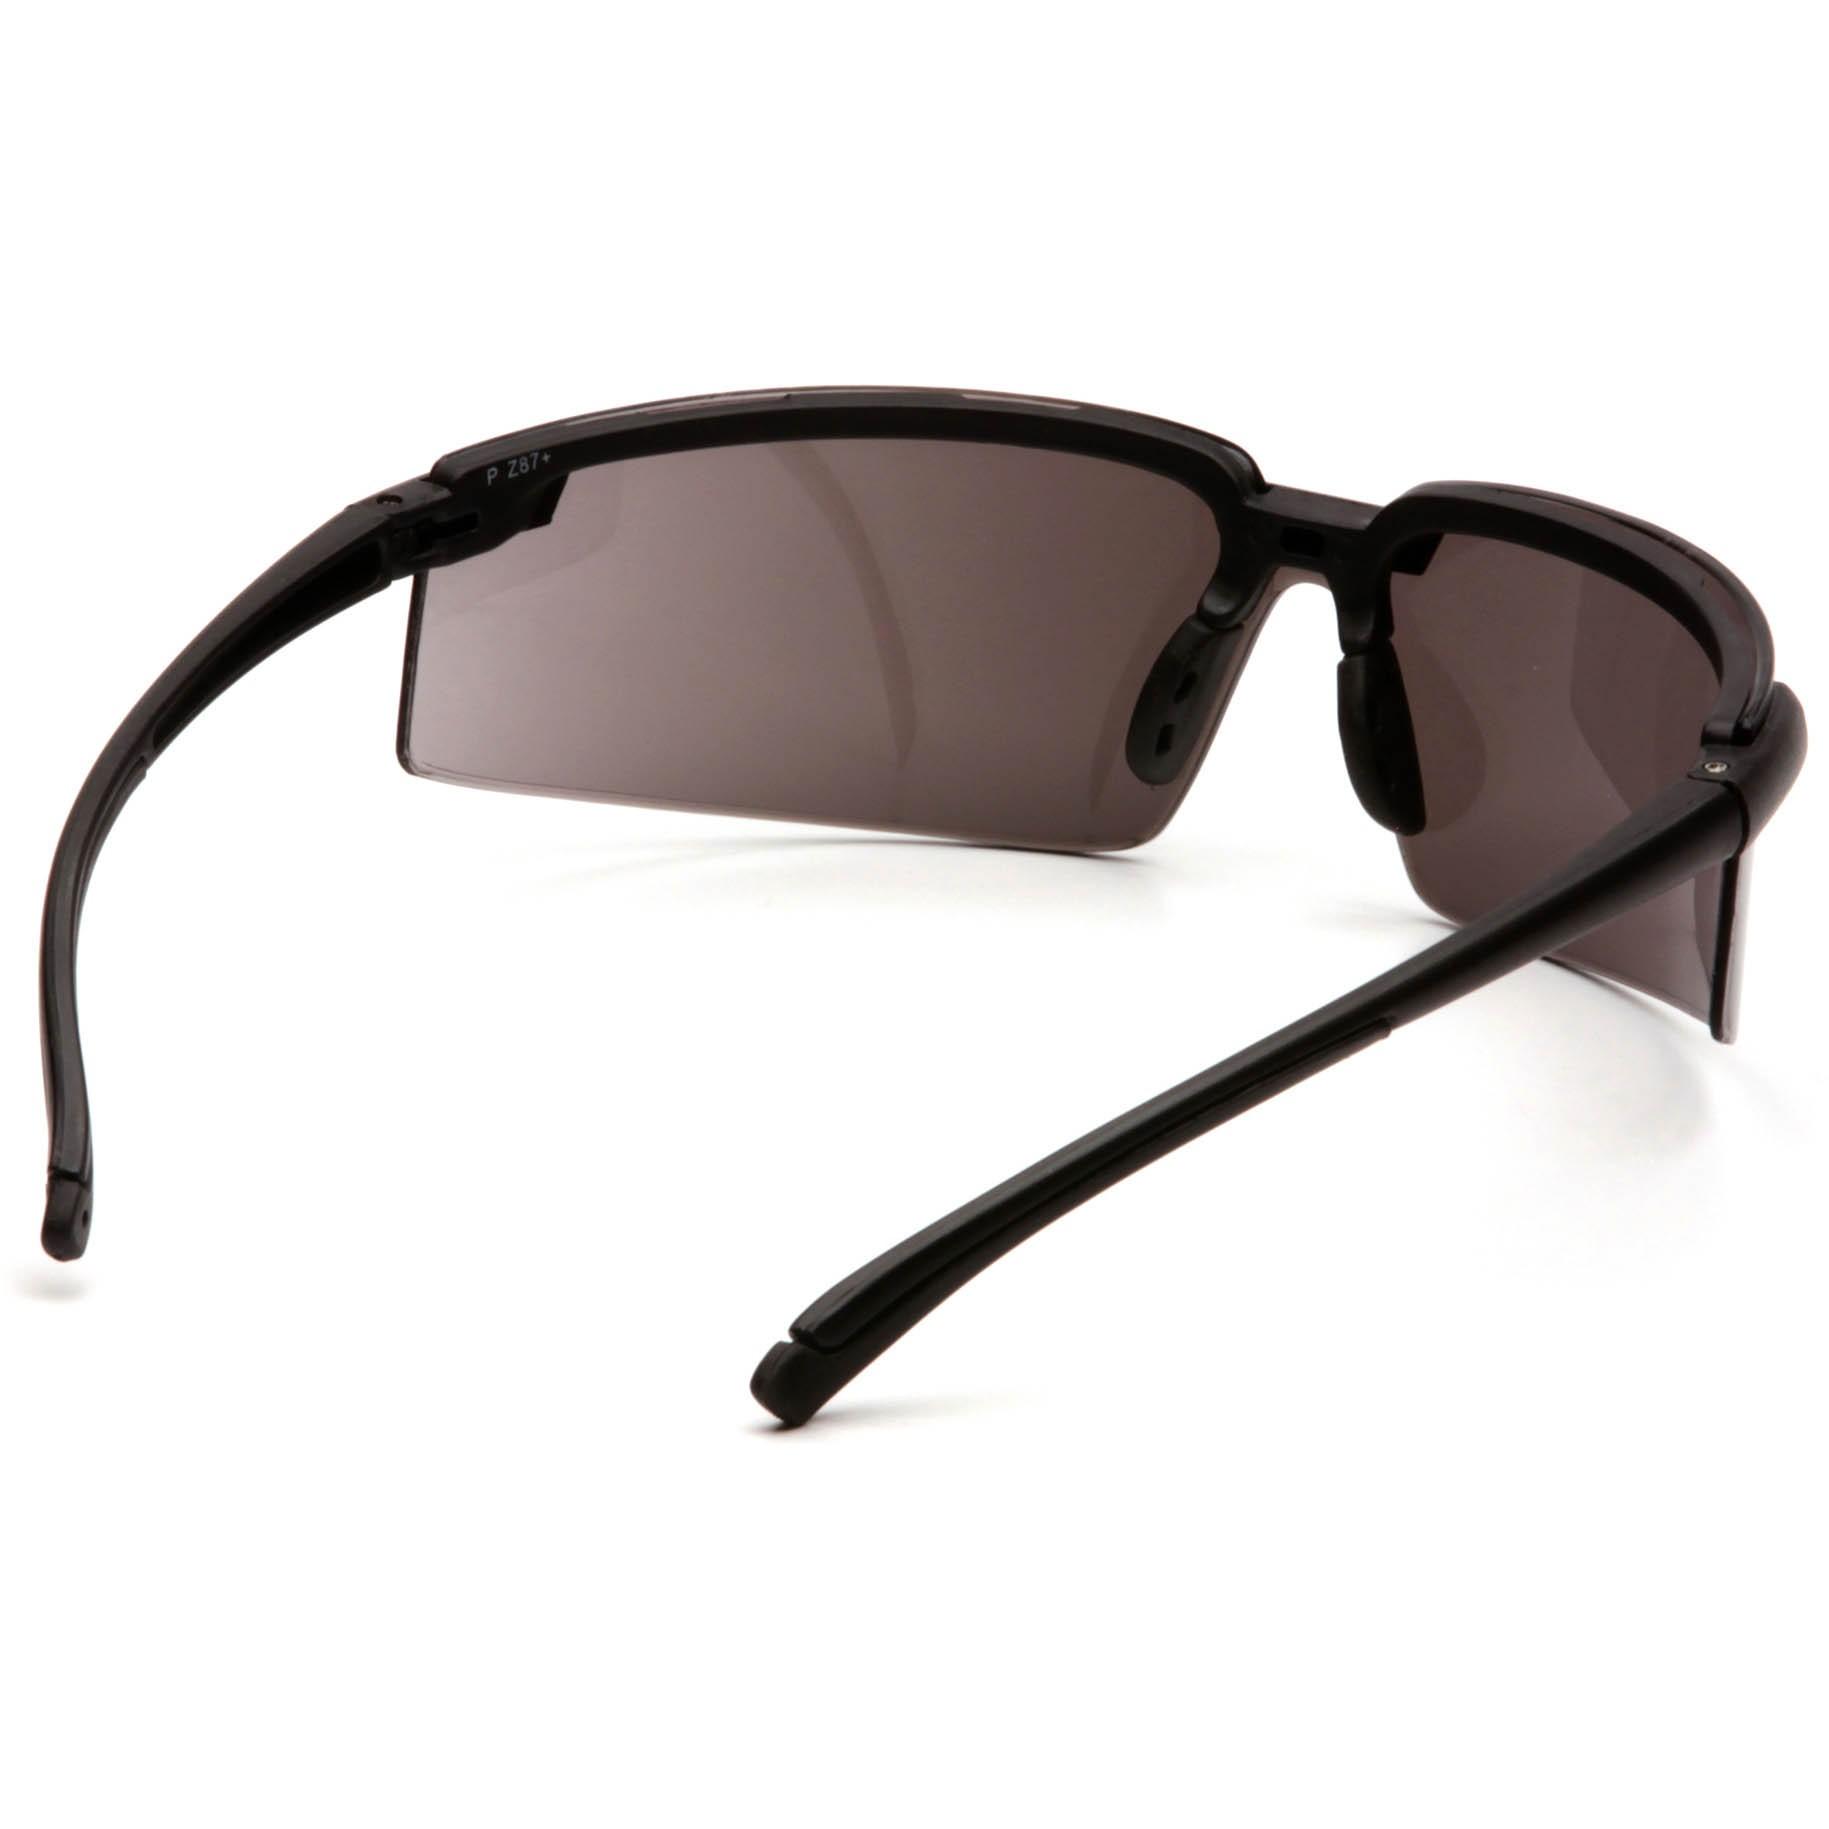 Safety Glasses Black Frame : Pyramex Surveyor Safety Glasses - Black Frame - Silver ...